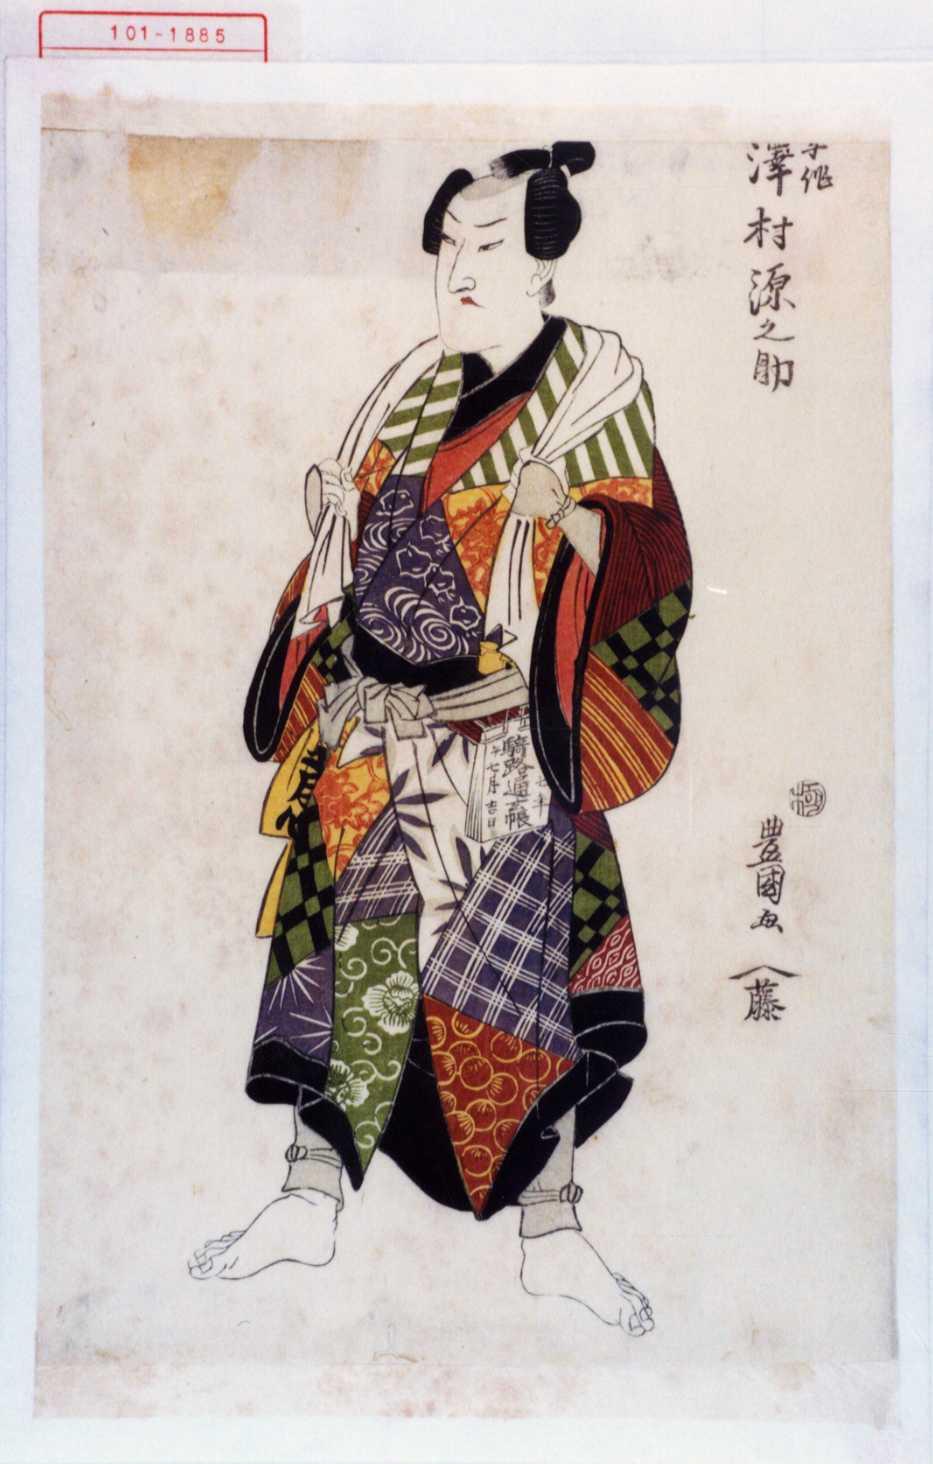 歌川豊国の画像 p1_31